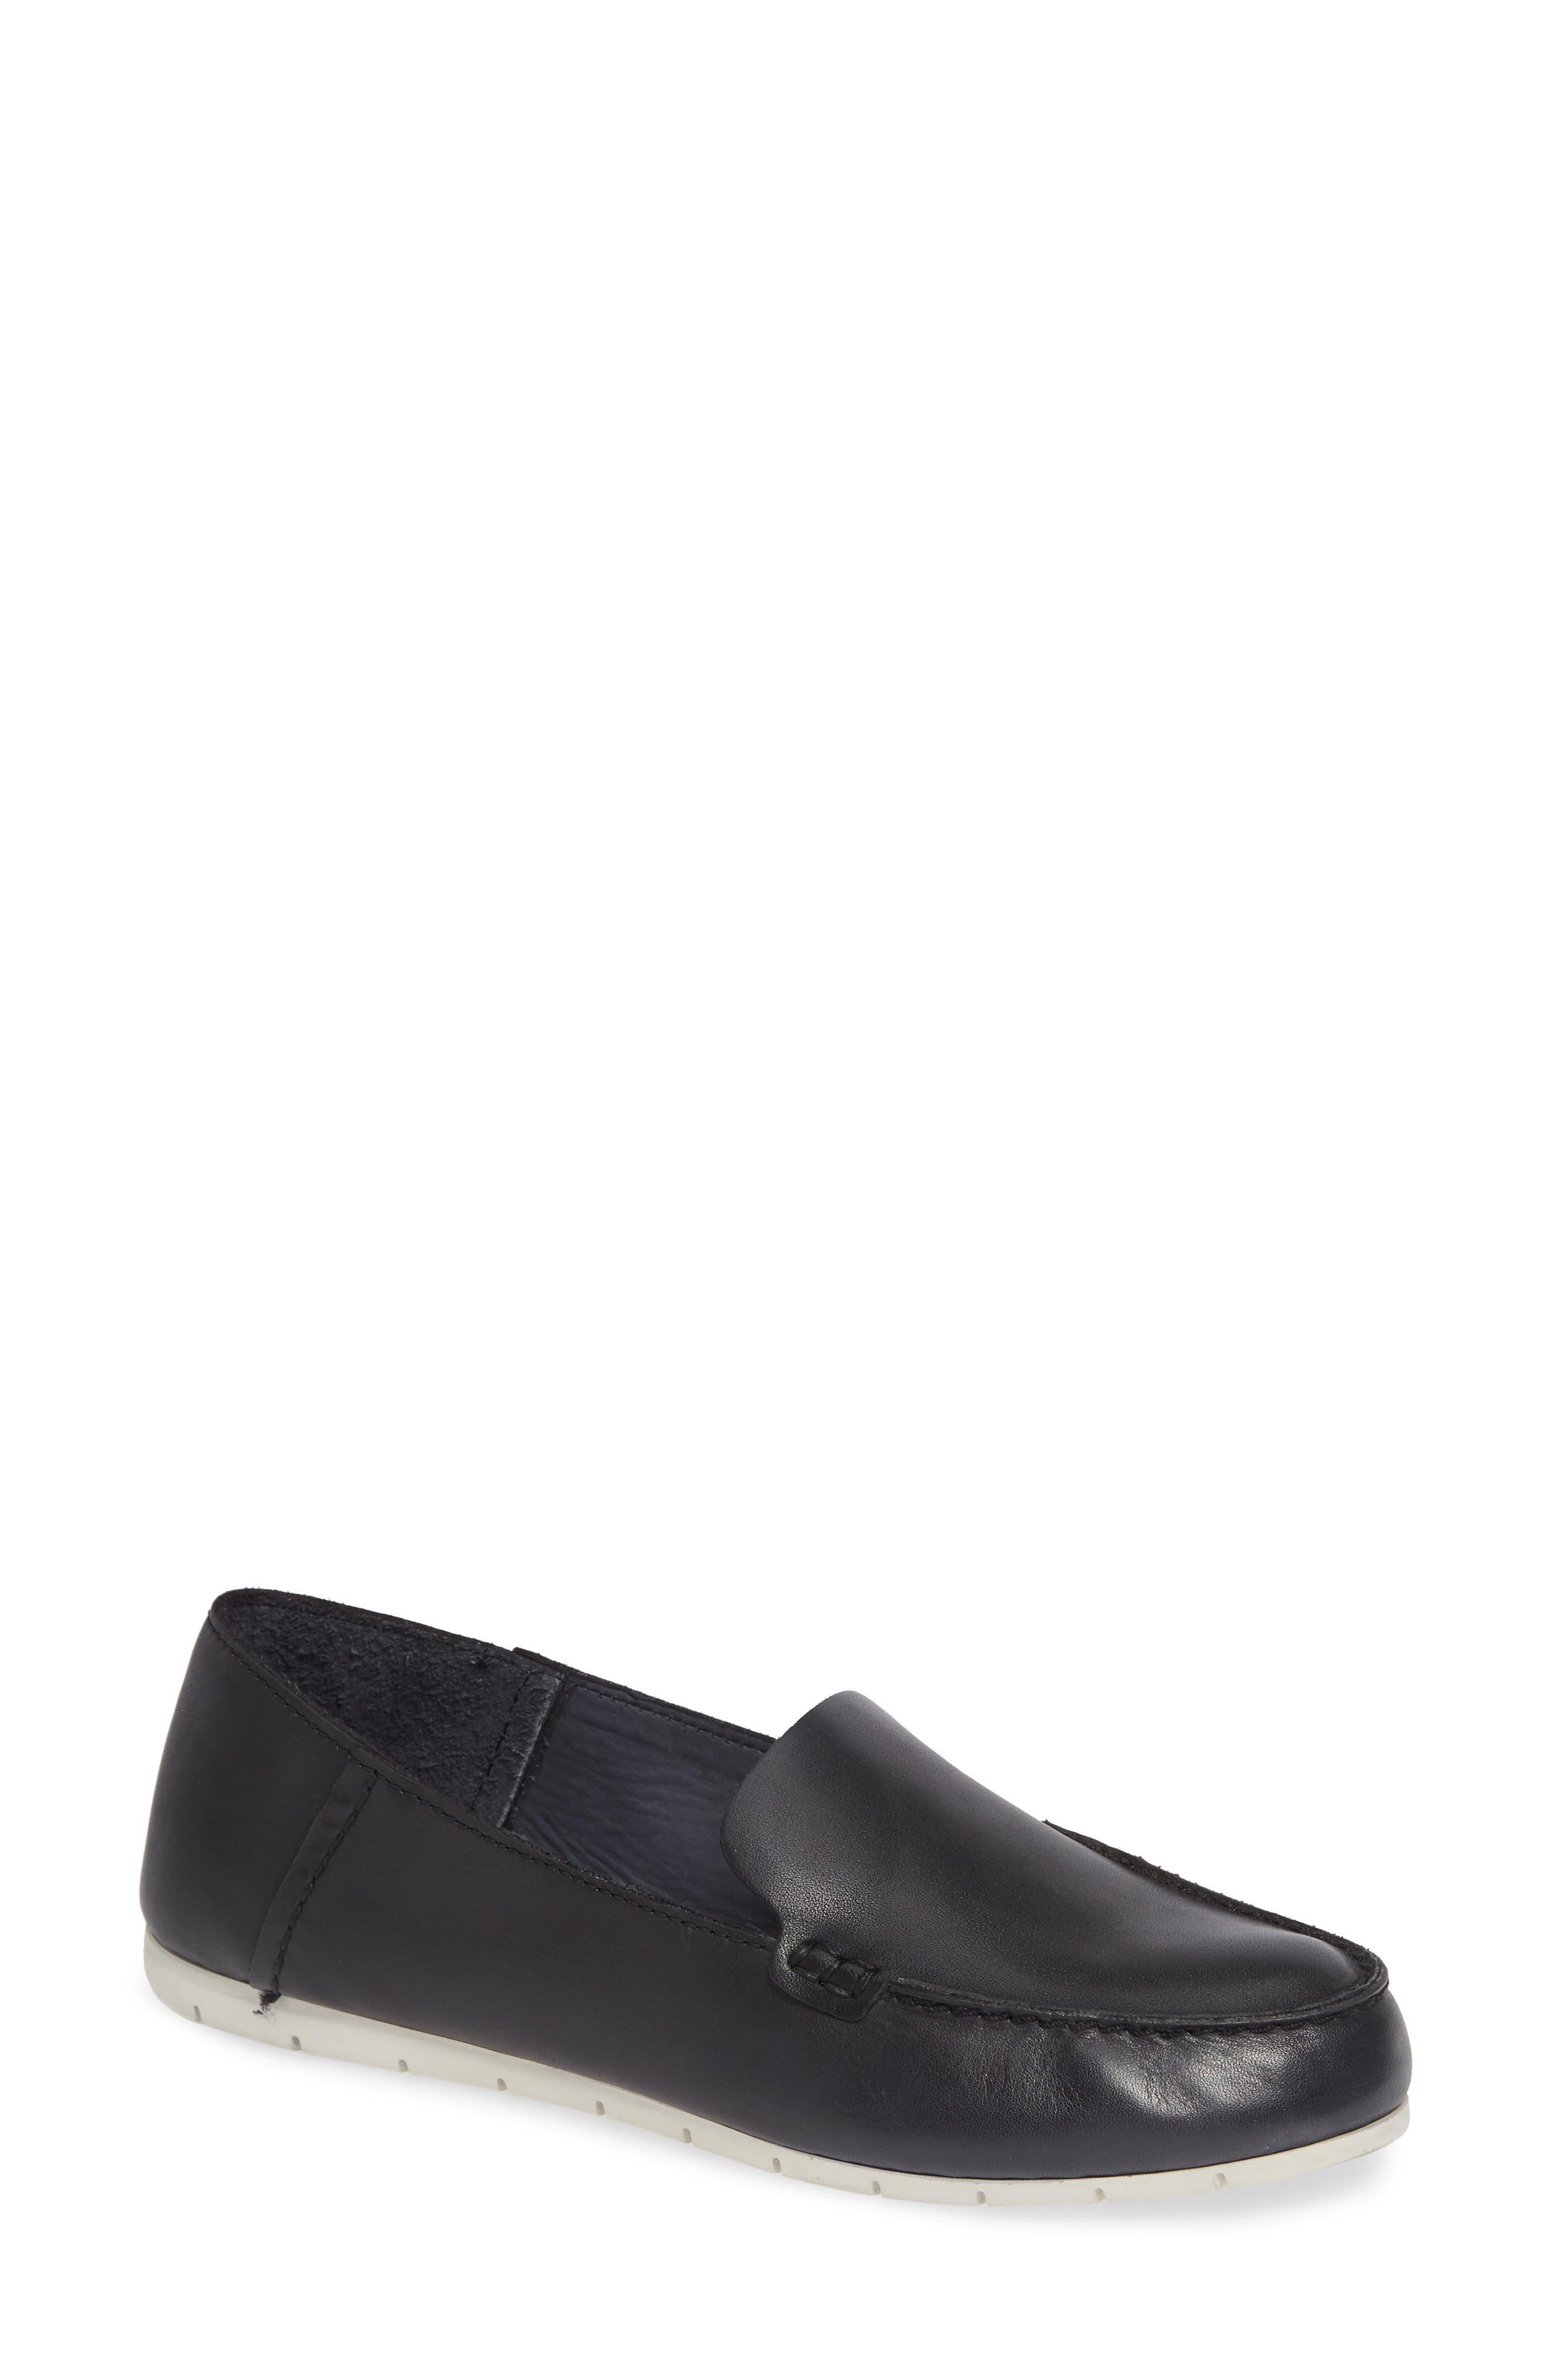 Sedona Venetian Loafer,                         Main,                         color, BLACK LEATHER